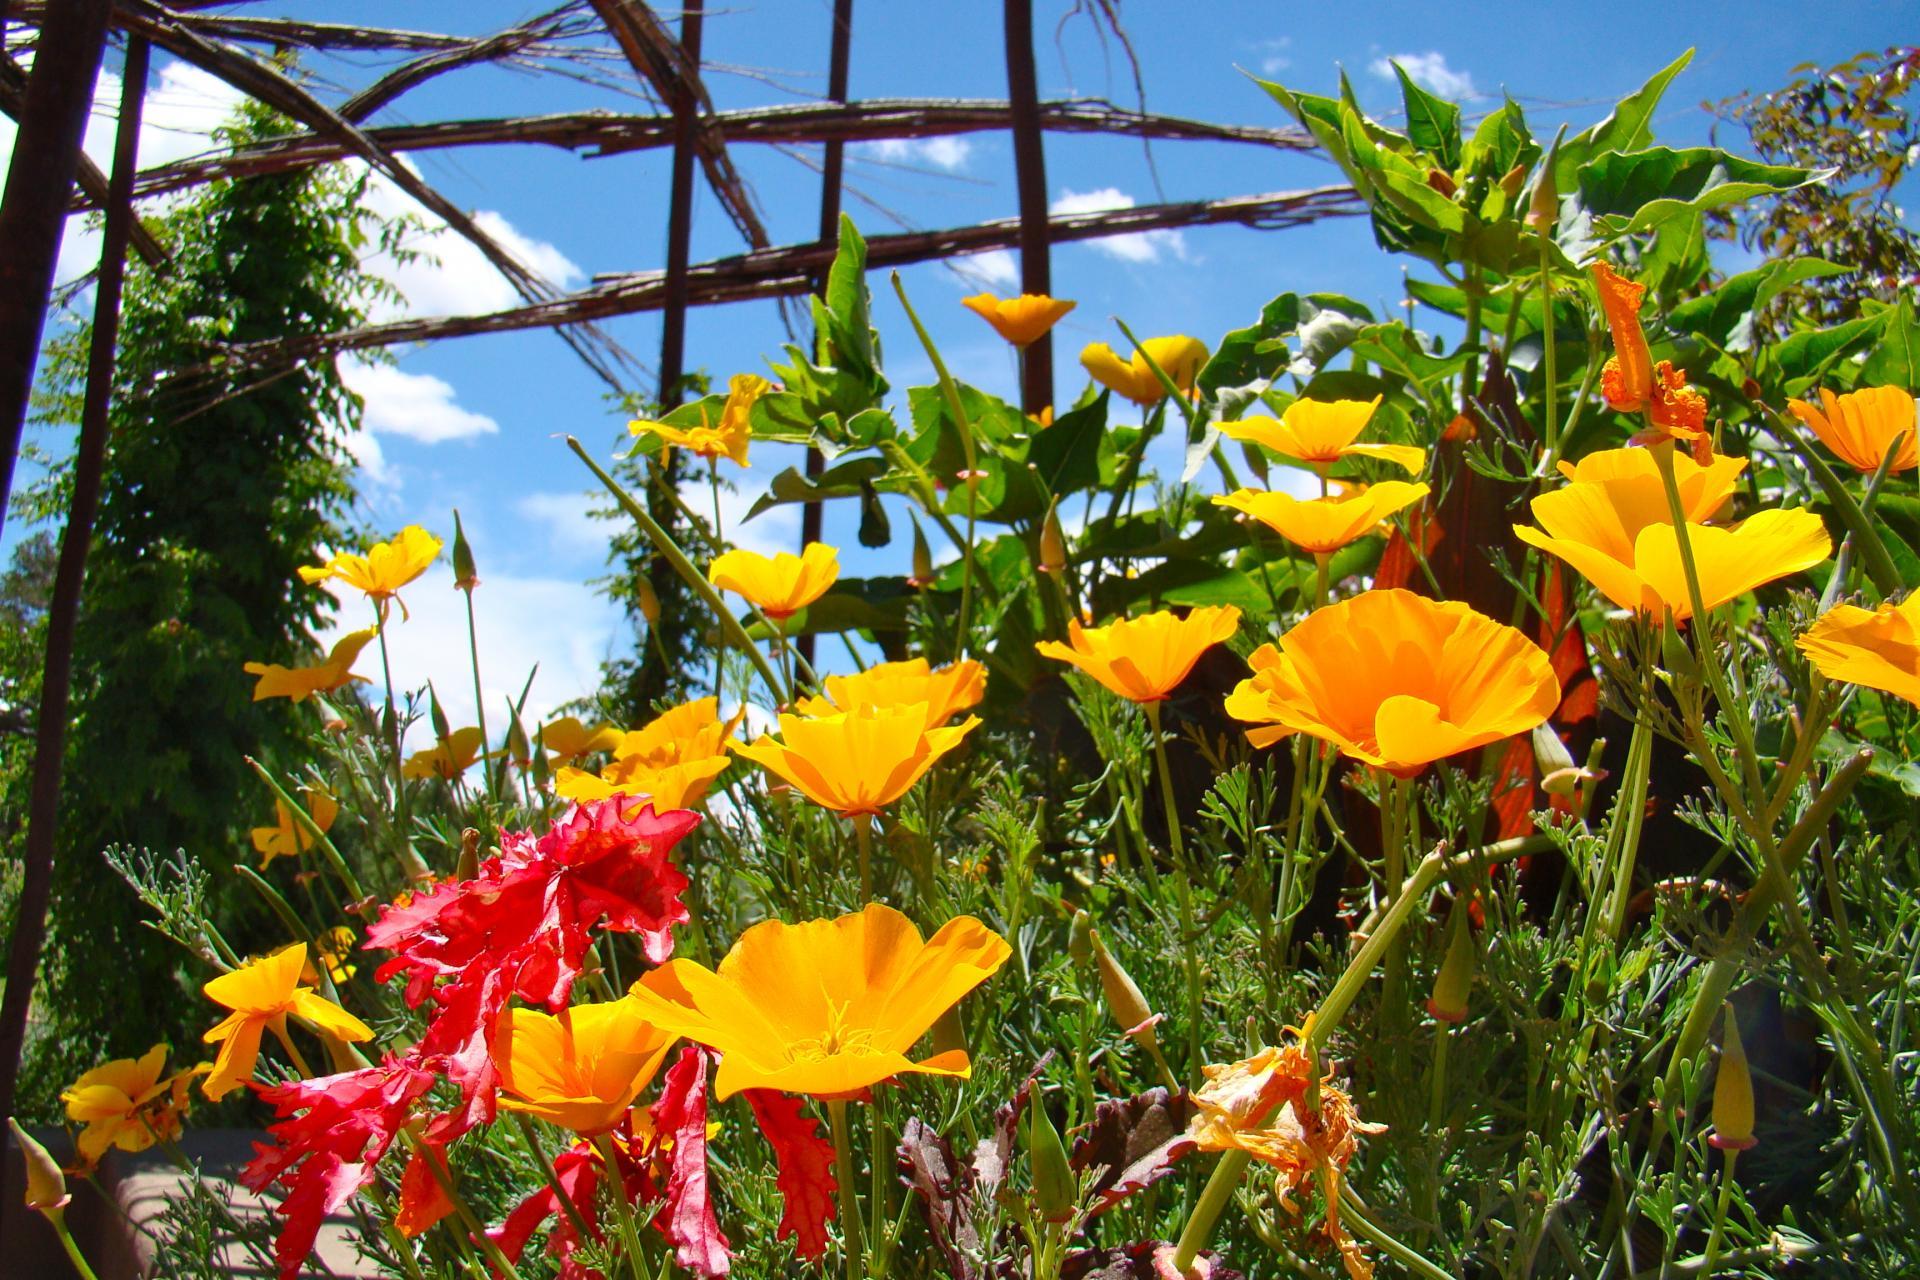 Santa Fe Botanical Garden Awarded Prestigious Imls Grant American Public Gardens Association